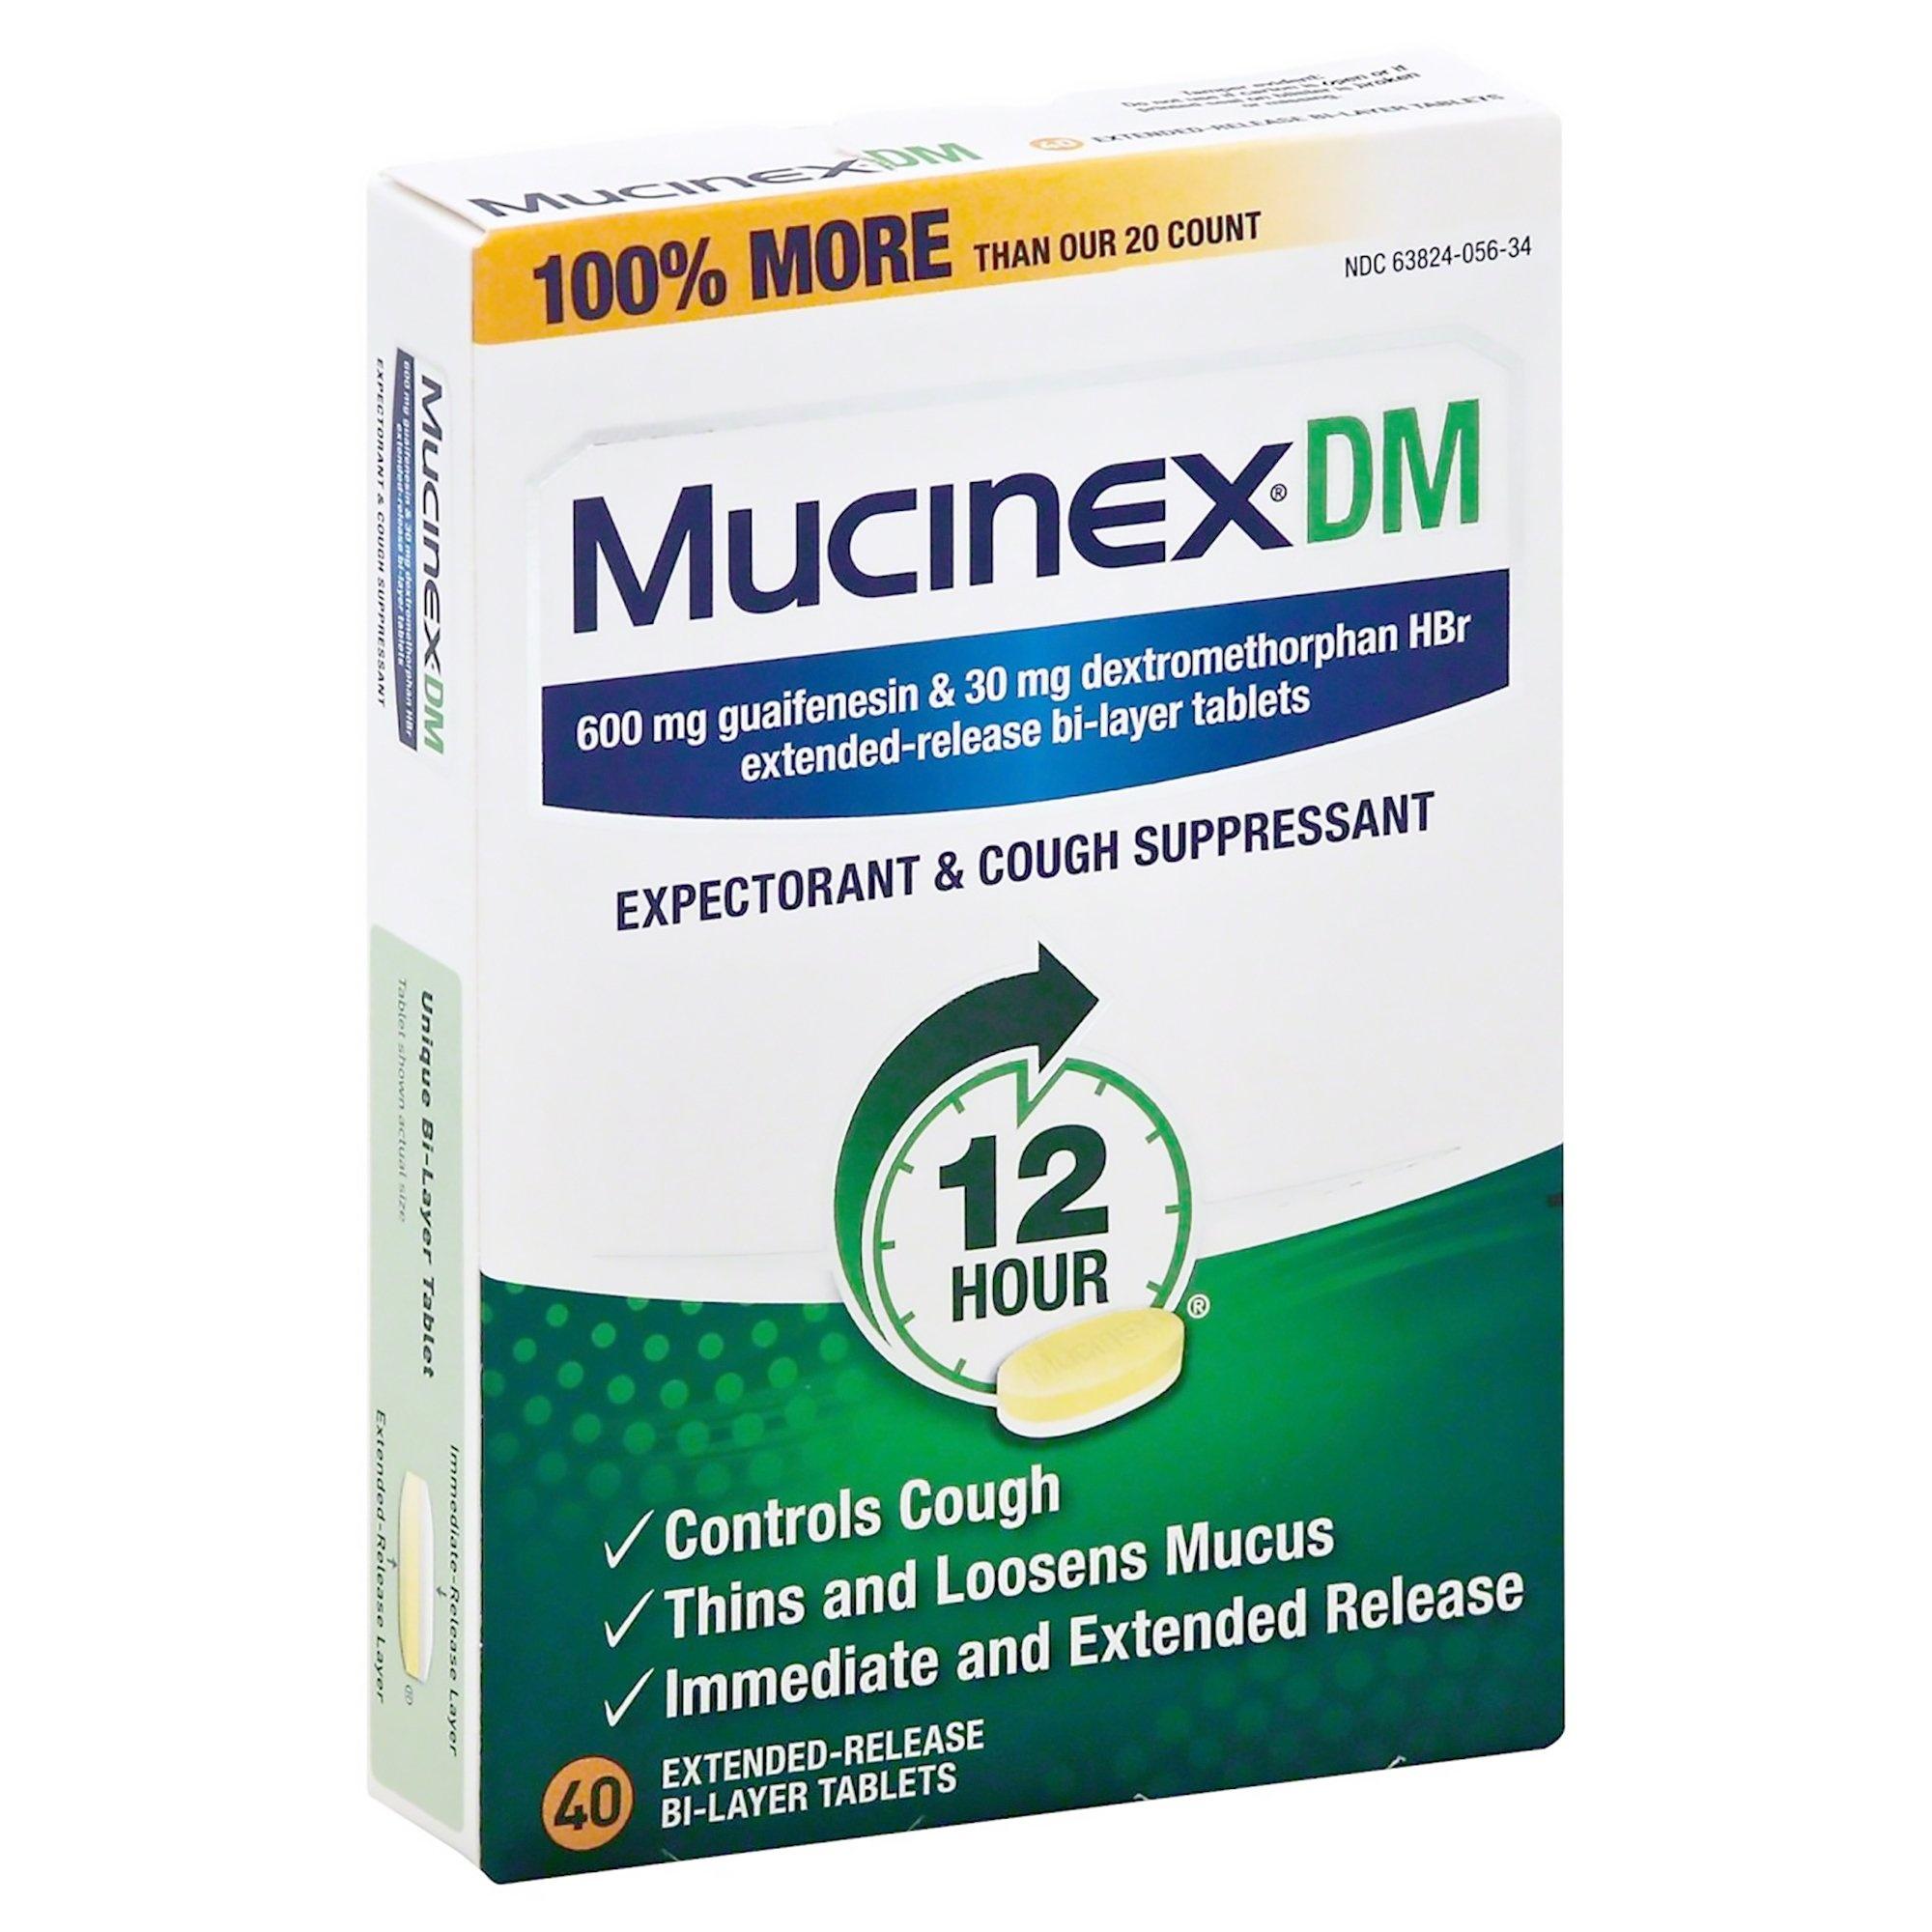 Mucinex DM Expectorant & Cough Suppressant, 600 mg, 63824005634, Box of 40